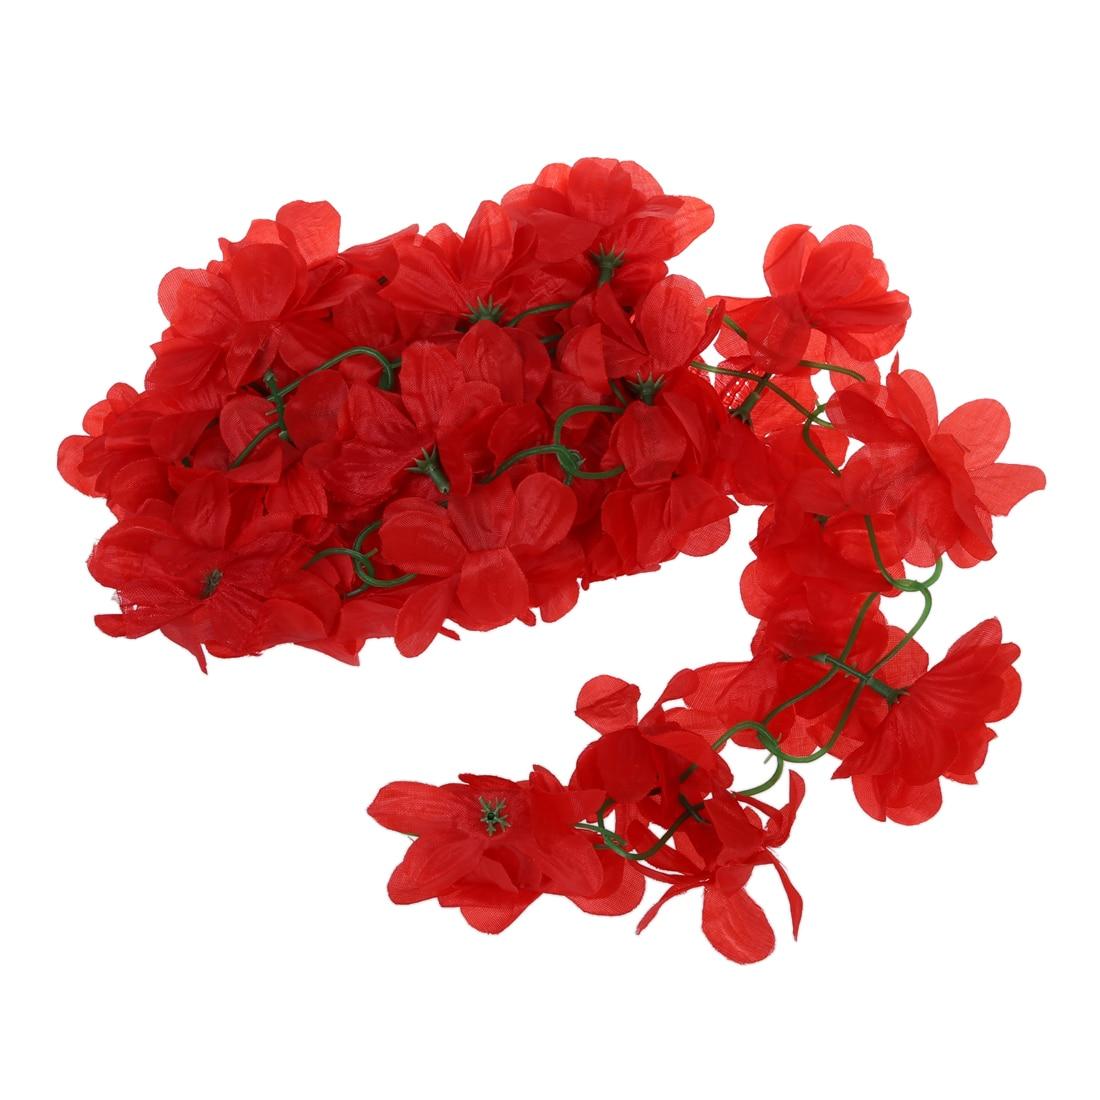 online get cheap red azalea flower -aliexpress | alibaba group